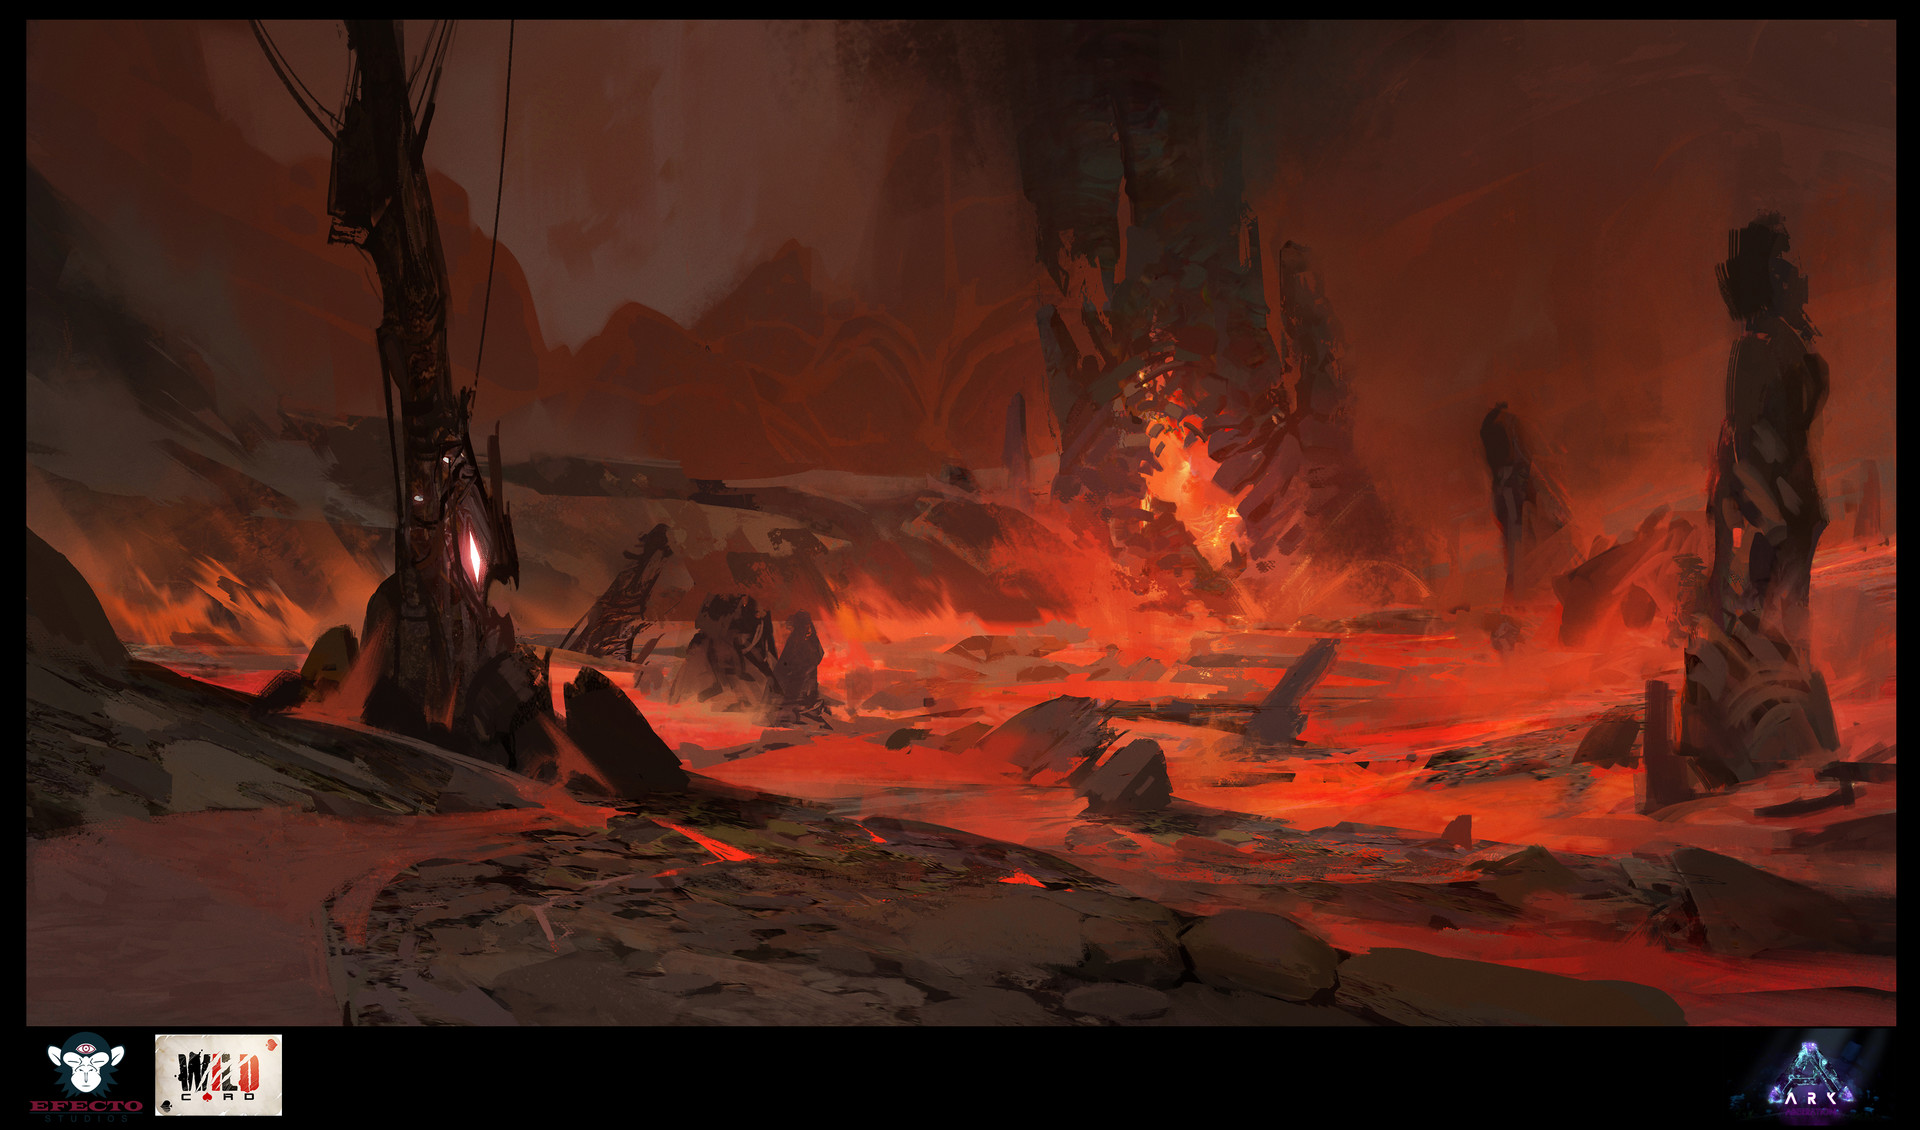 ArtStation - Aberration: Red Caves, Sebastian Kowoll